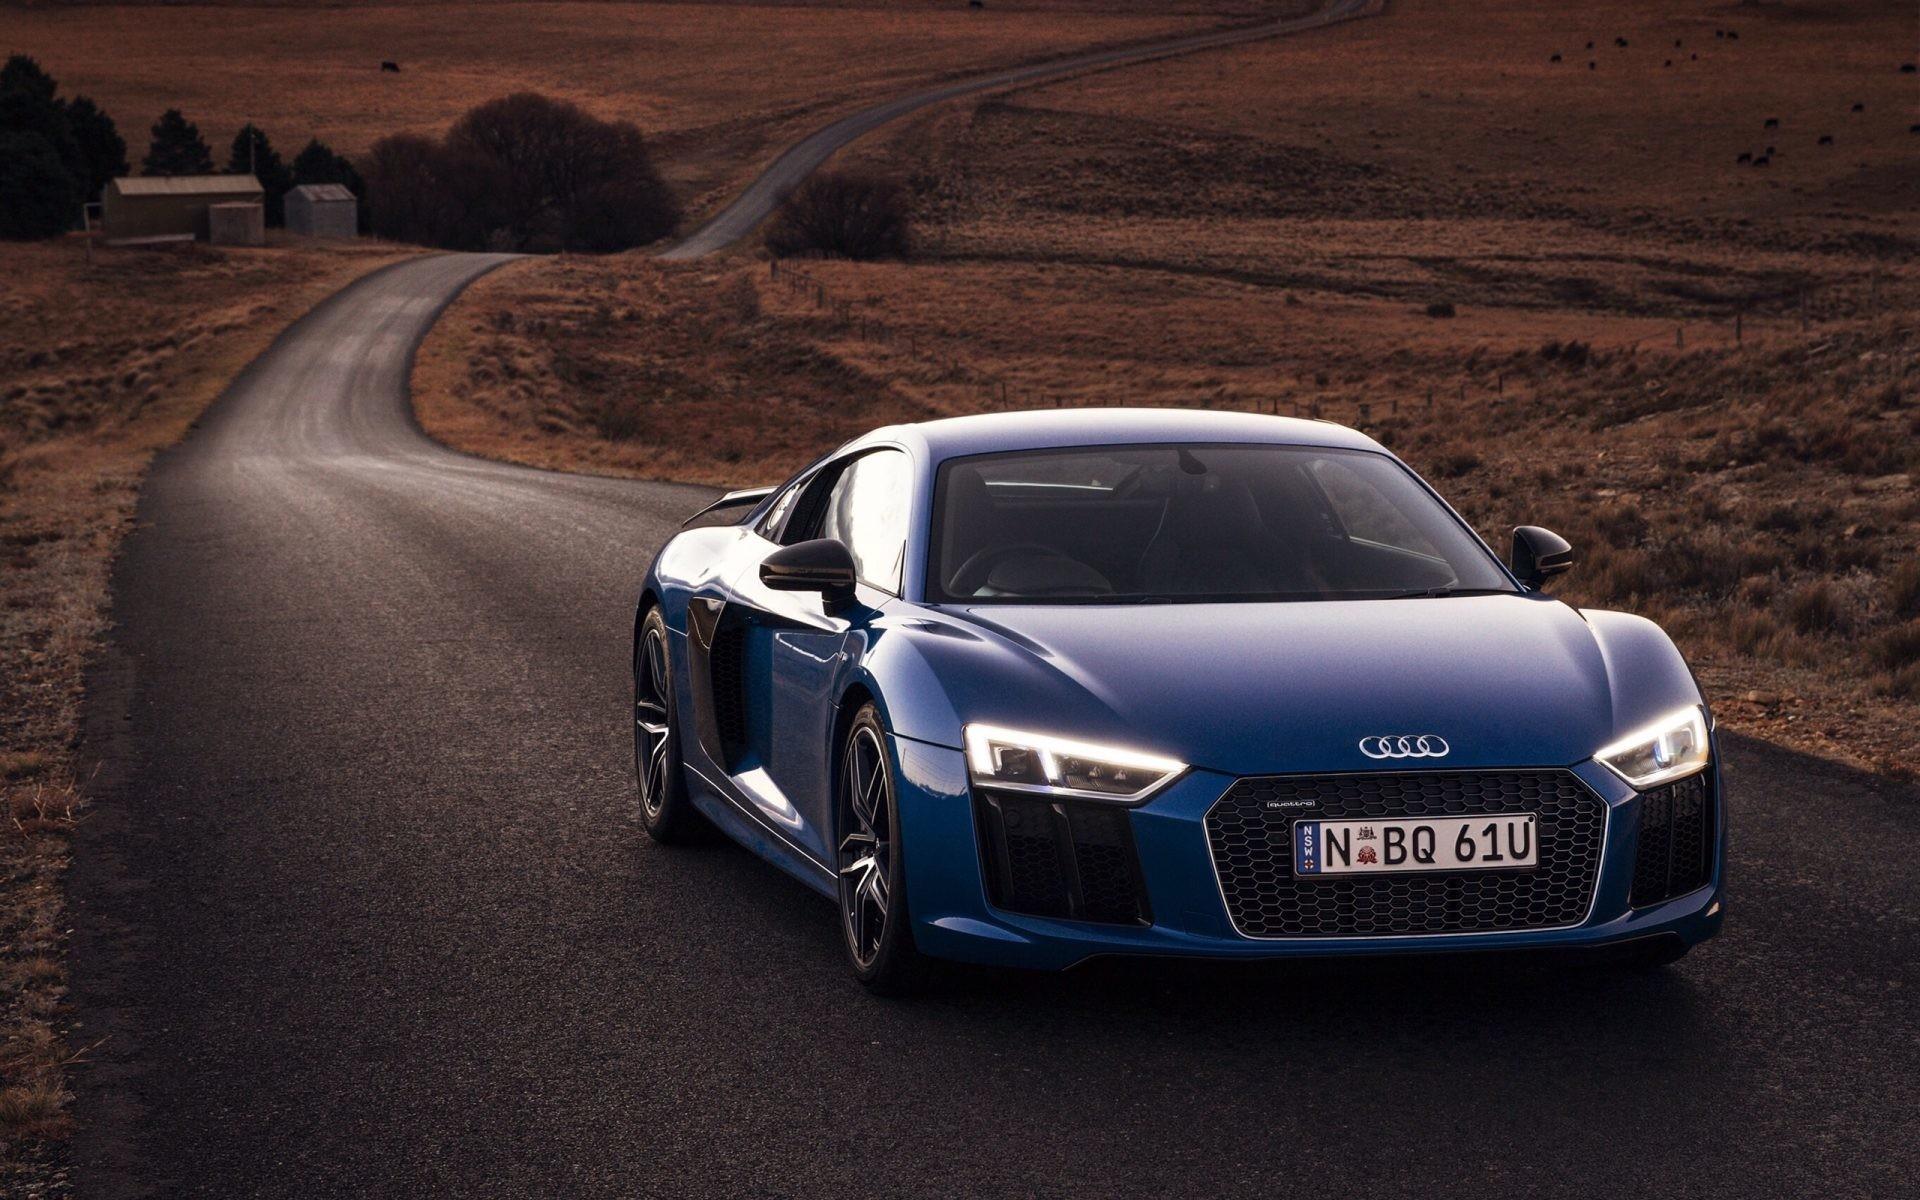 Audi R8 V10 blue car front view lights 4k UHD wallpaper